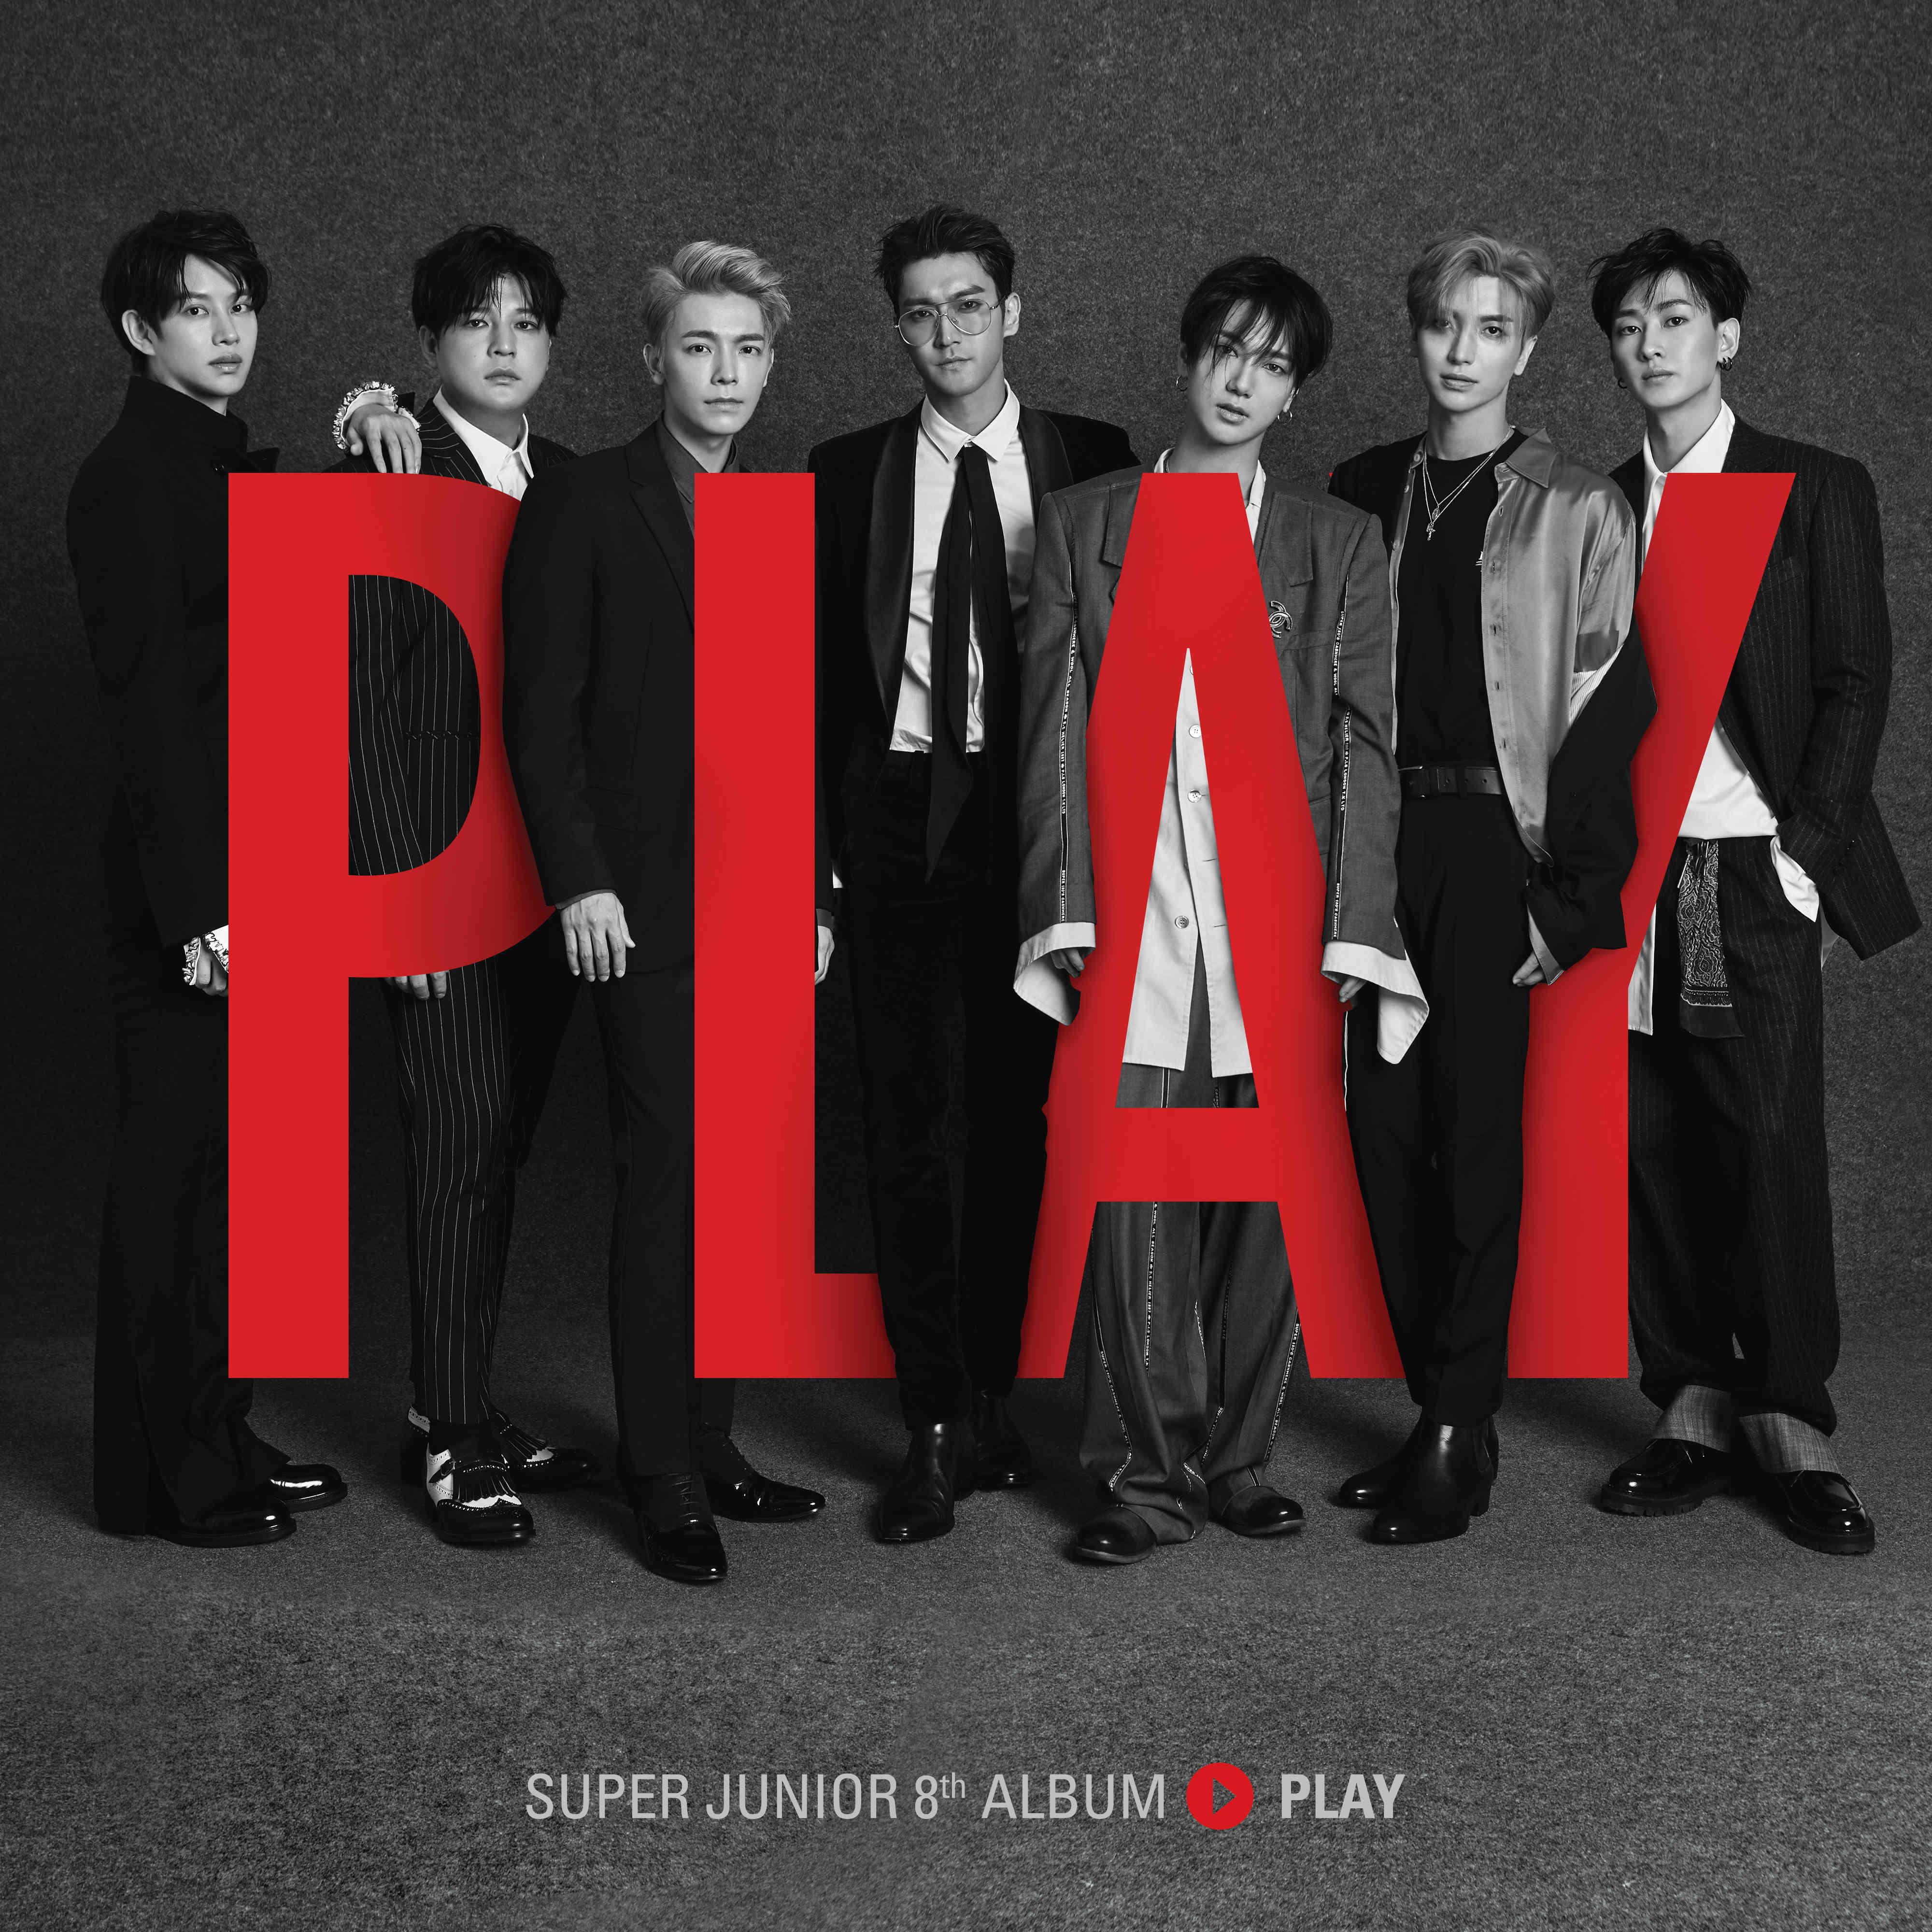 Super Junior通过《M COUNTDOWN》首次公开回归舞台